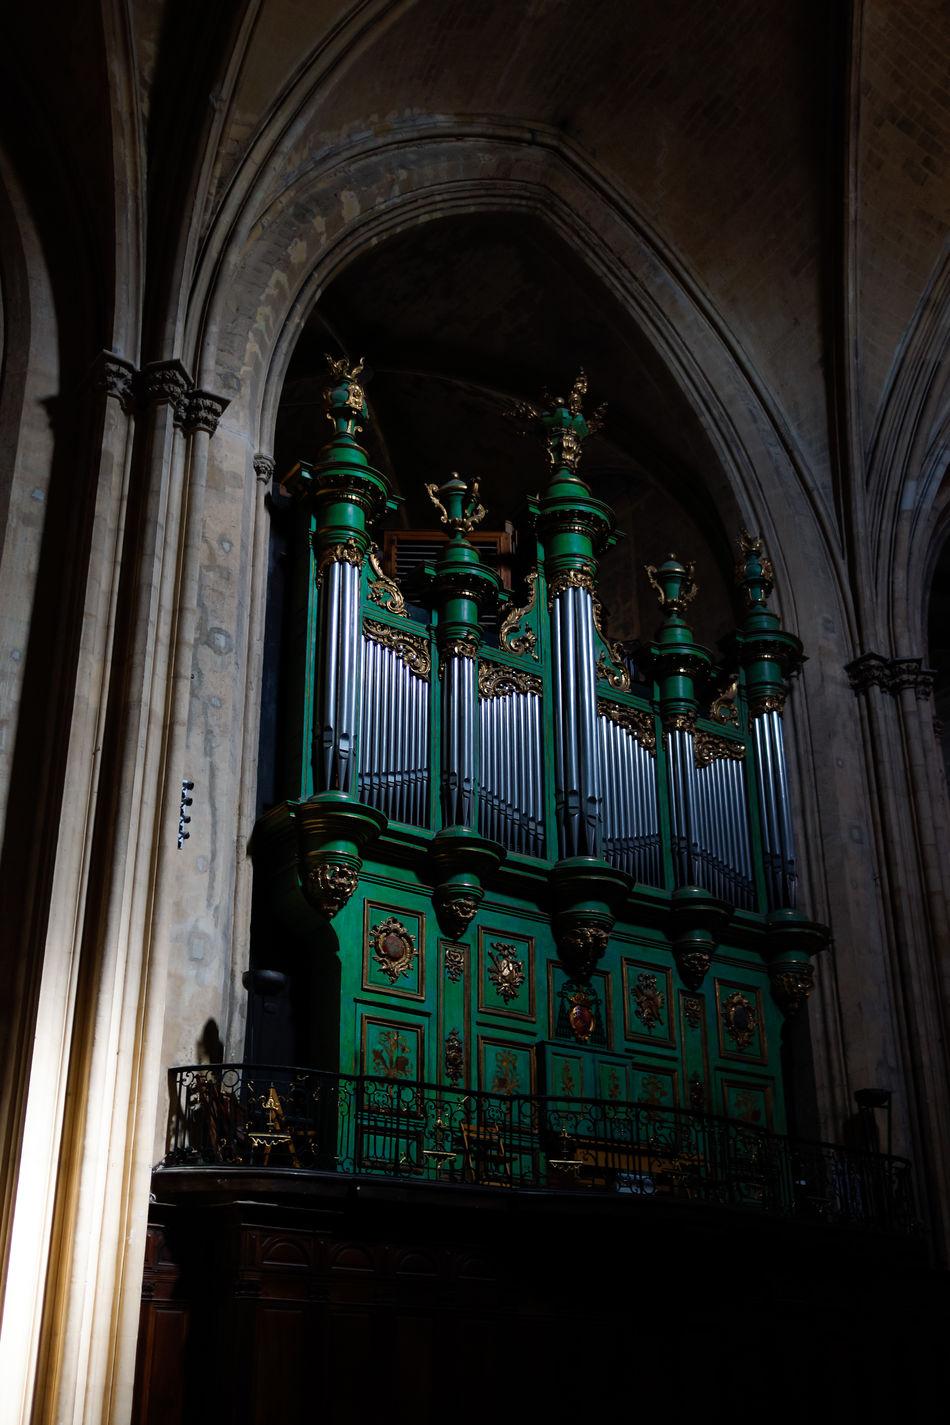 Green organ inside catholic church Architectural Feature Church Column Instrument Interior Keyboard Keyboard Instrument Music Music Instrument Organ Organum Place Of Worship Rare Religion